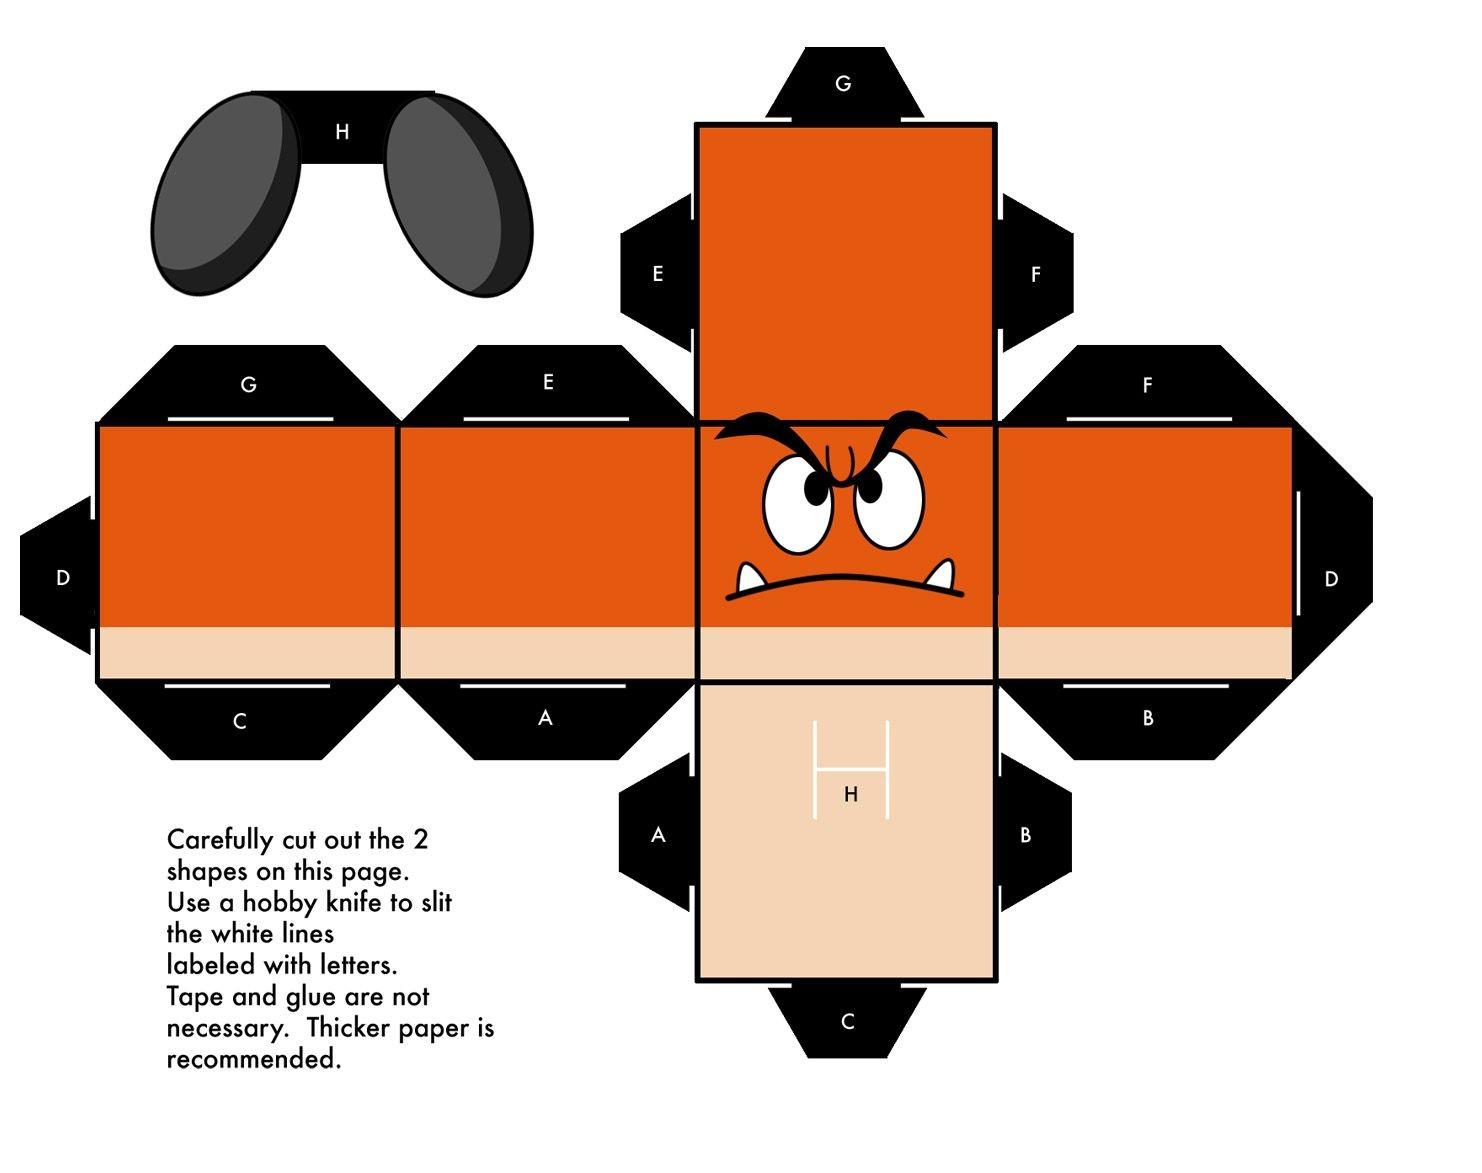 Super Mario Papercraft Papercraft Mario Angry Birds Matt Groening[para Imprimir